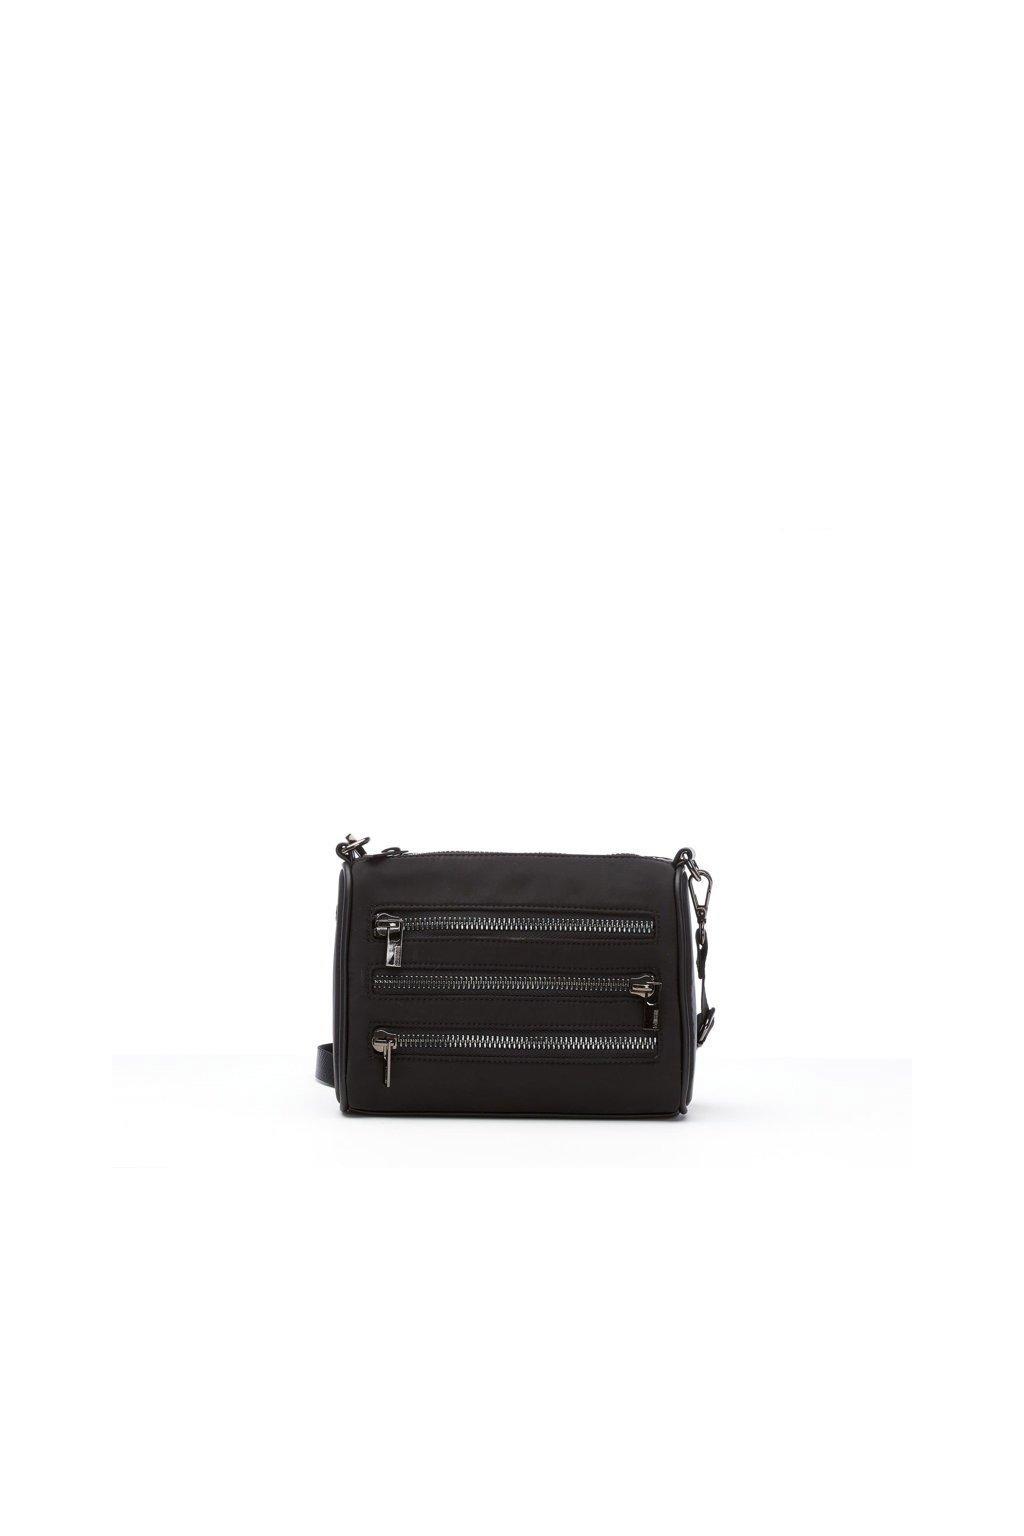 Dámska kabelka čierna kód kabelky GG574146 BLK